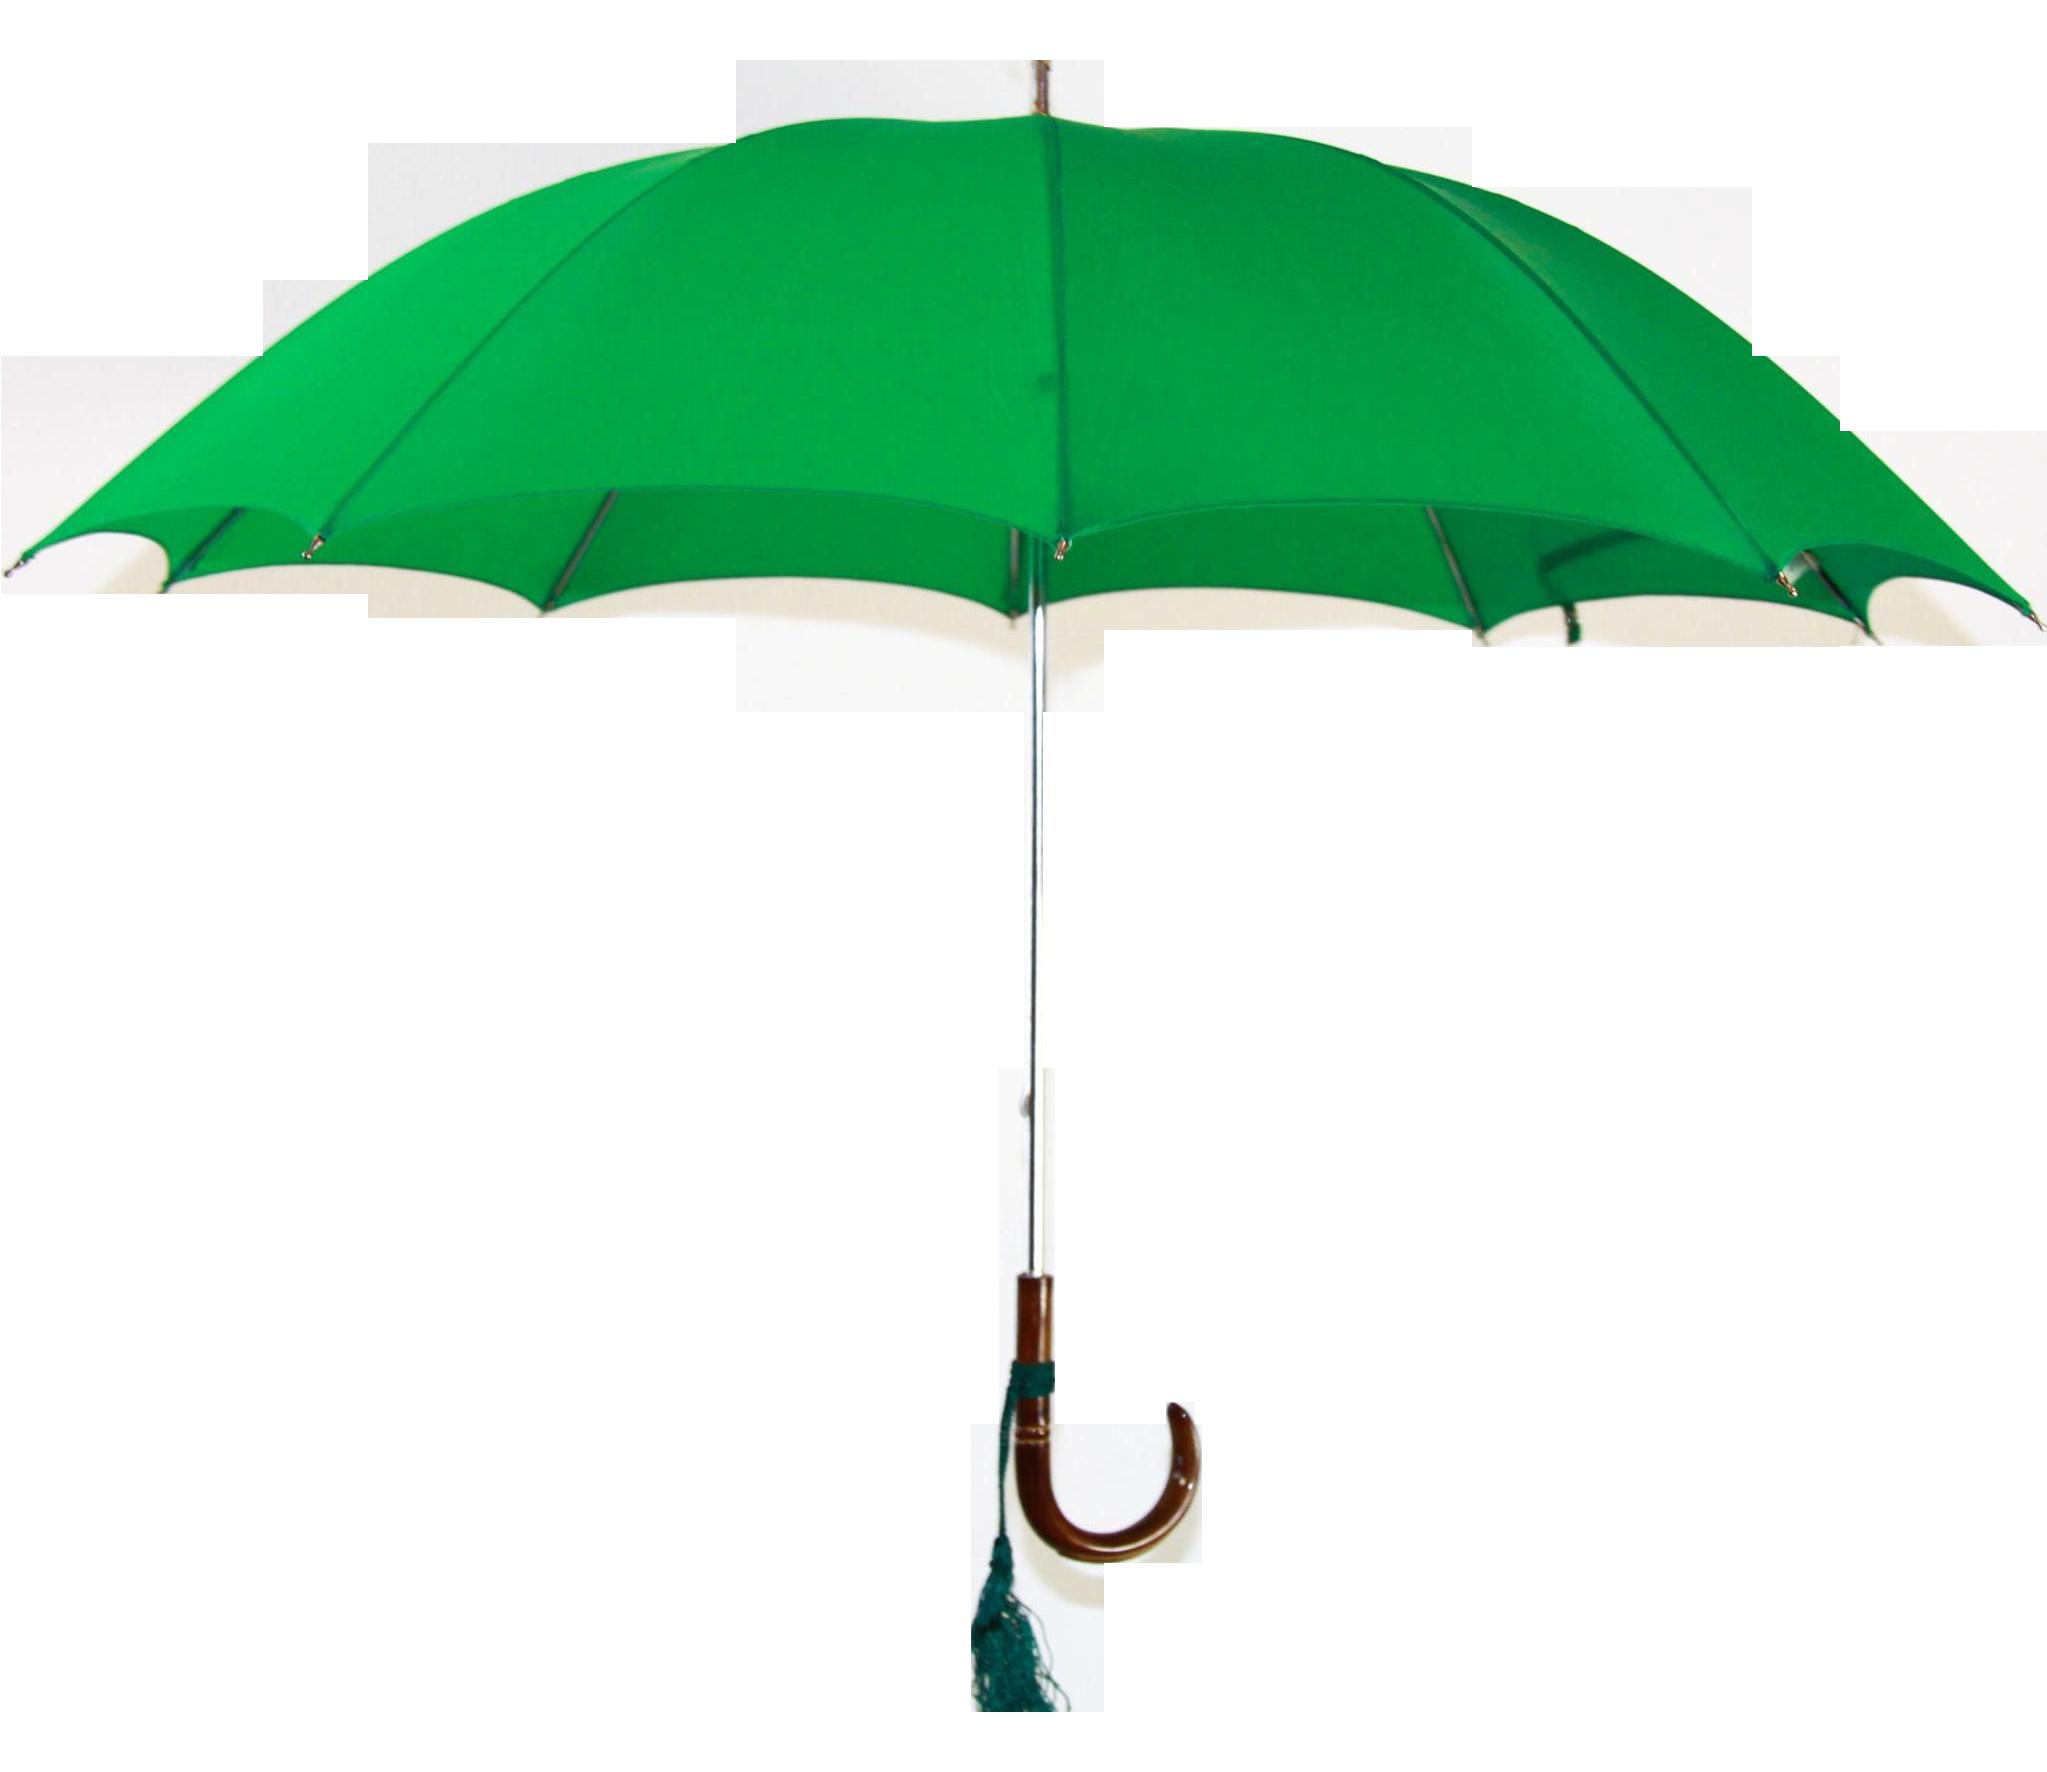 Vintage Green Umbrella With Custom Italian Handle Chairish